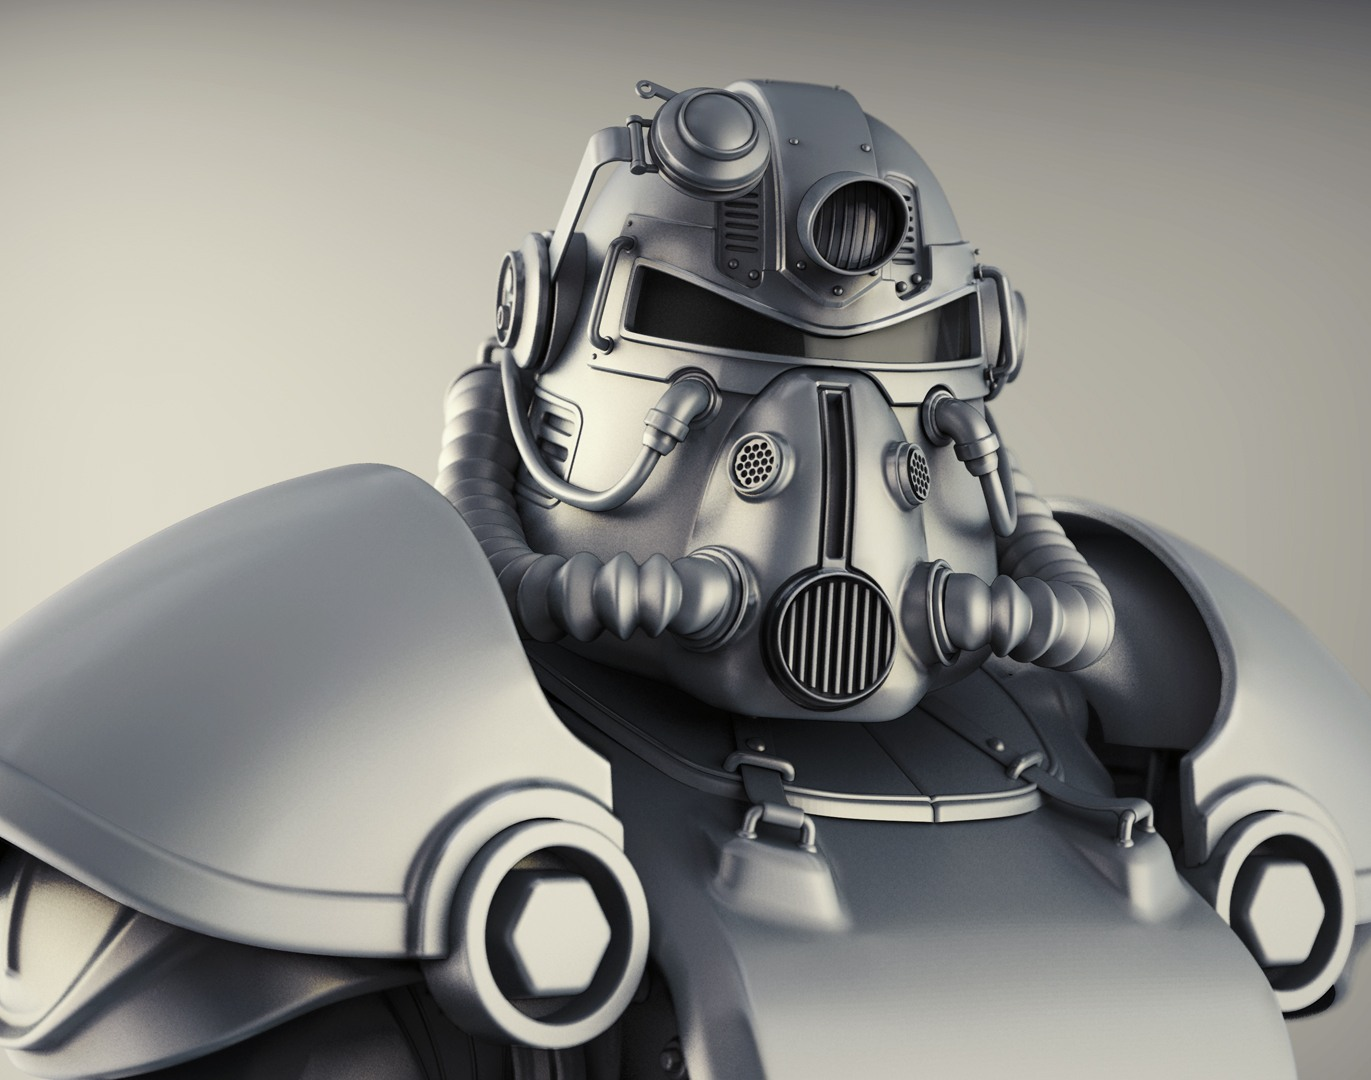 Fallout 4 New Vegas 3 The Elder Scrolls V Skyrim Wasteland Automotive